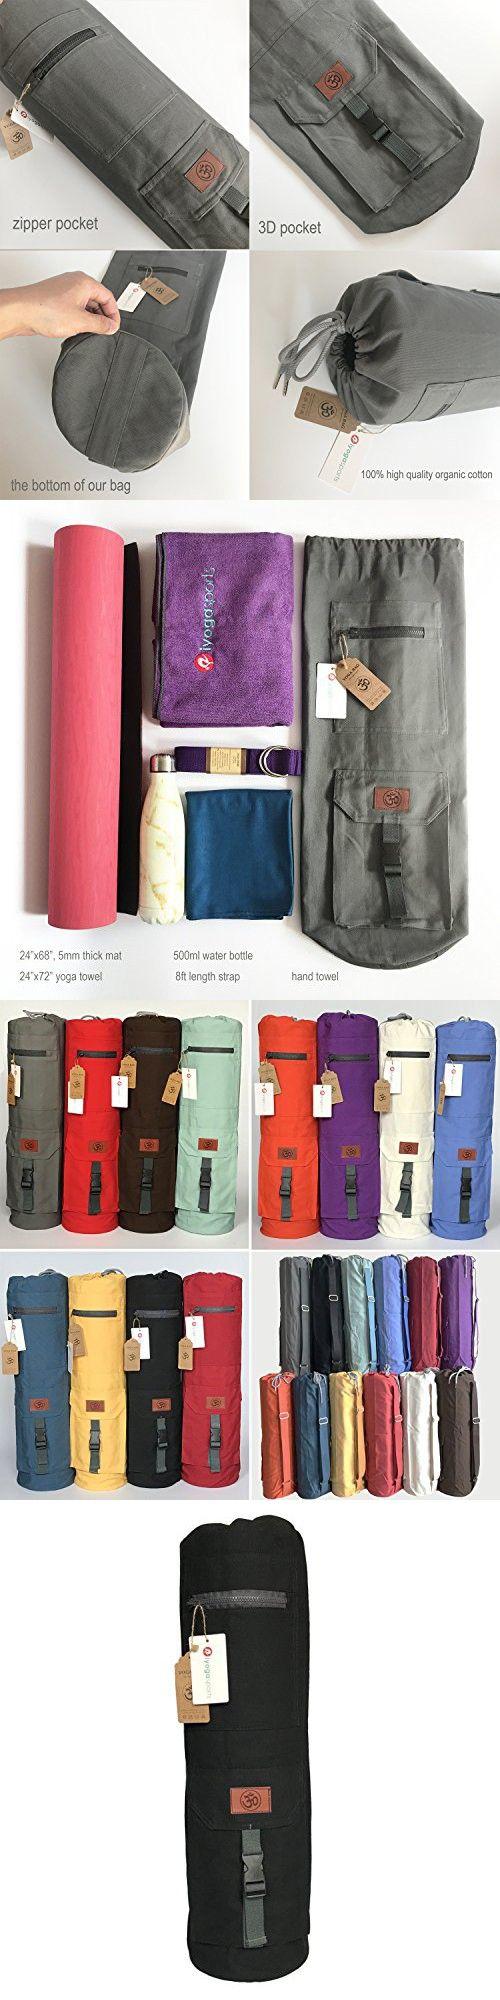 100 Organic Cotton Yoga Bag Diameter 7 X Height 27 5 Black Color Yoga Bag Price Only Yoga Mat Bag Mat Bag Bags